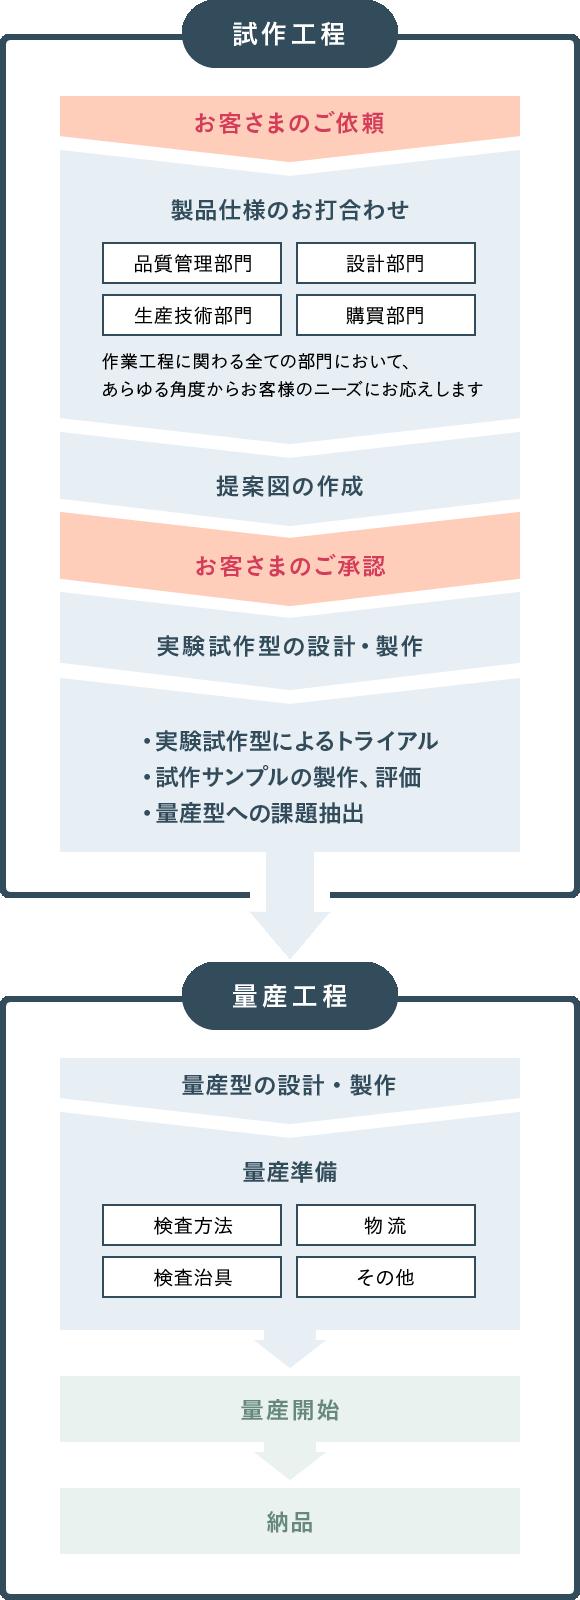 内藤製作所開発フロー